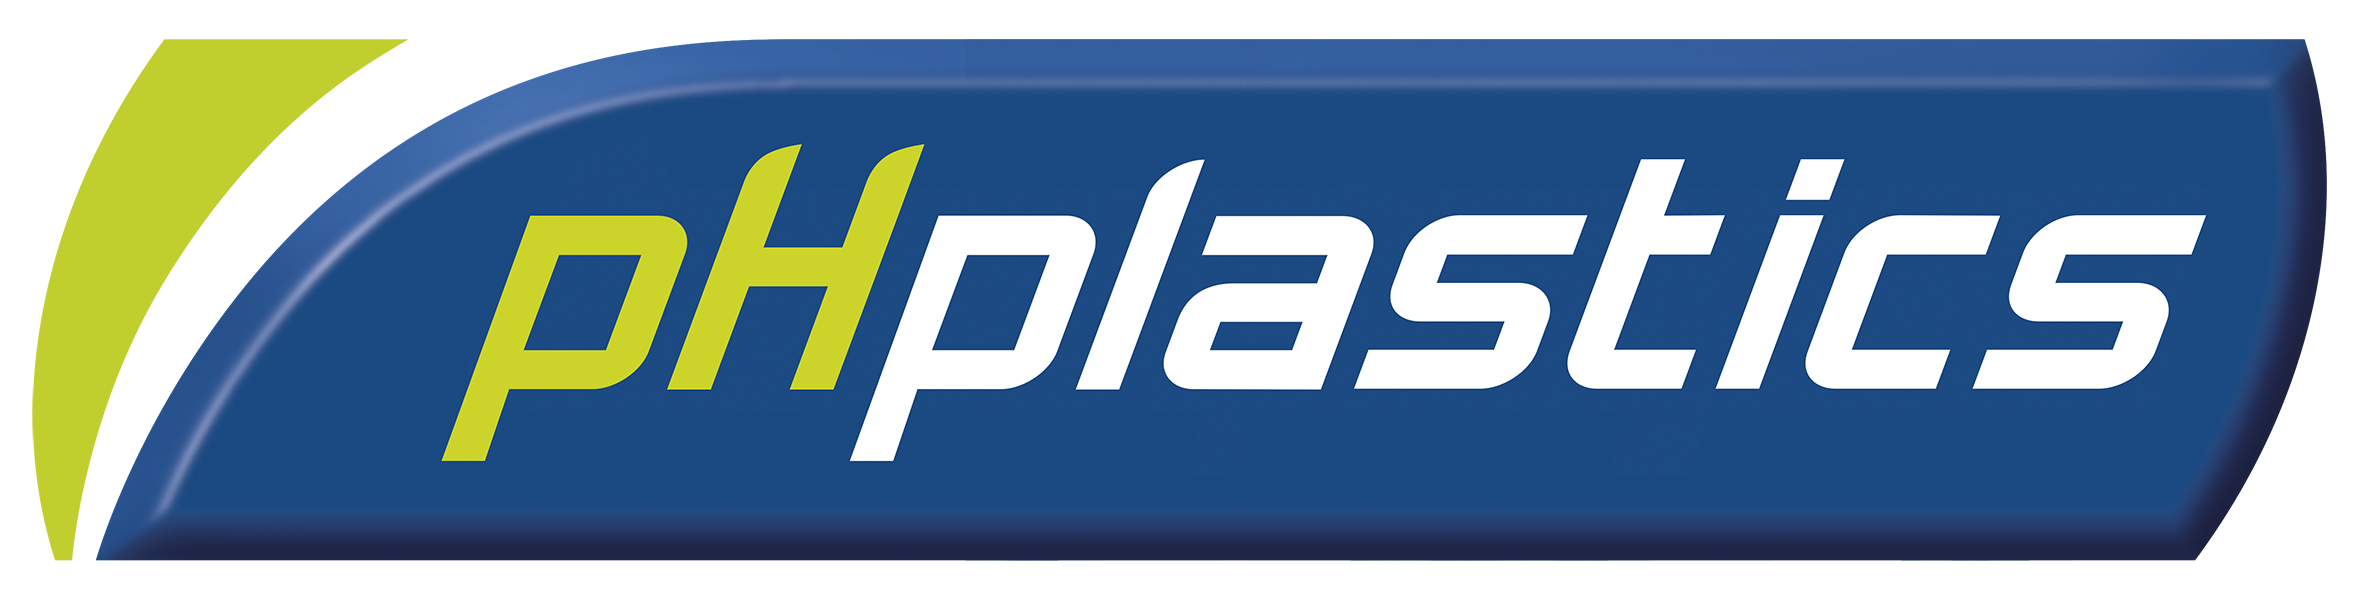 pHplastics